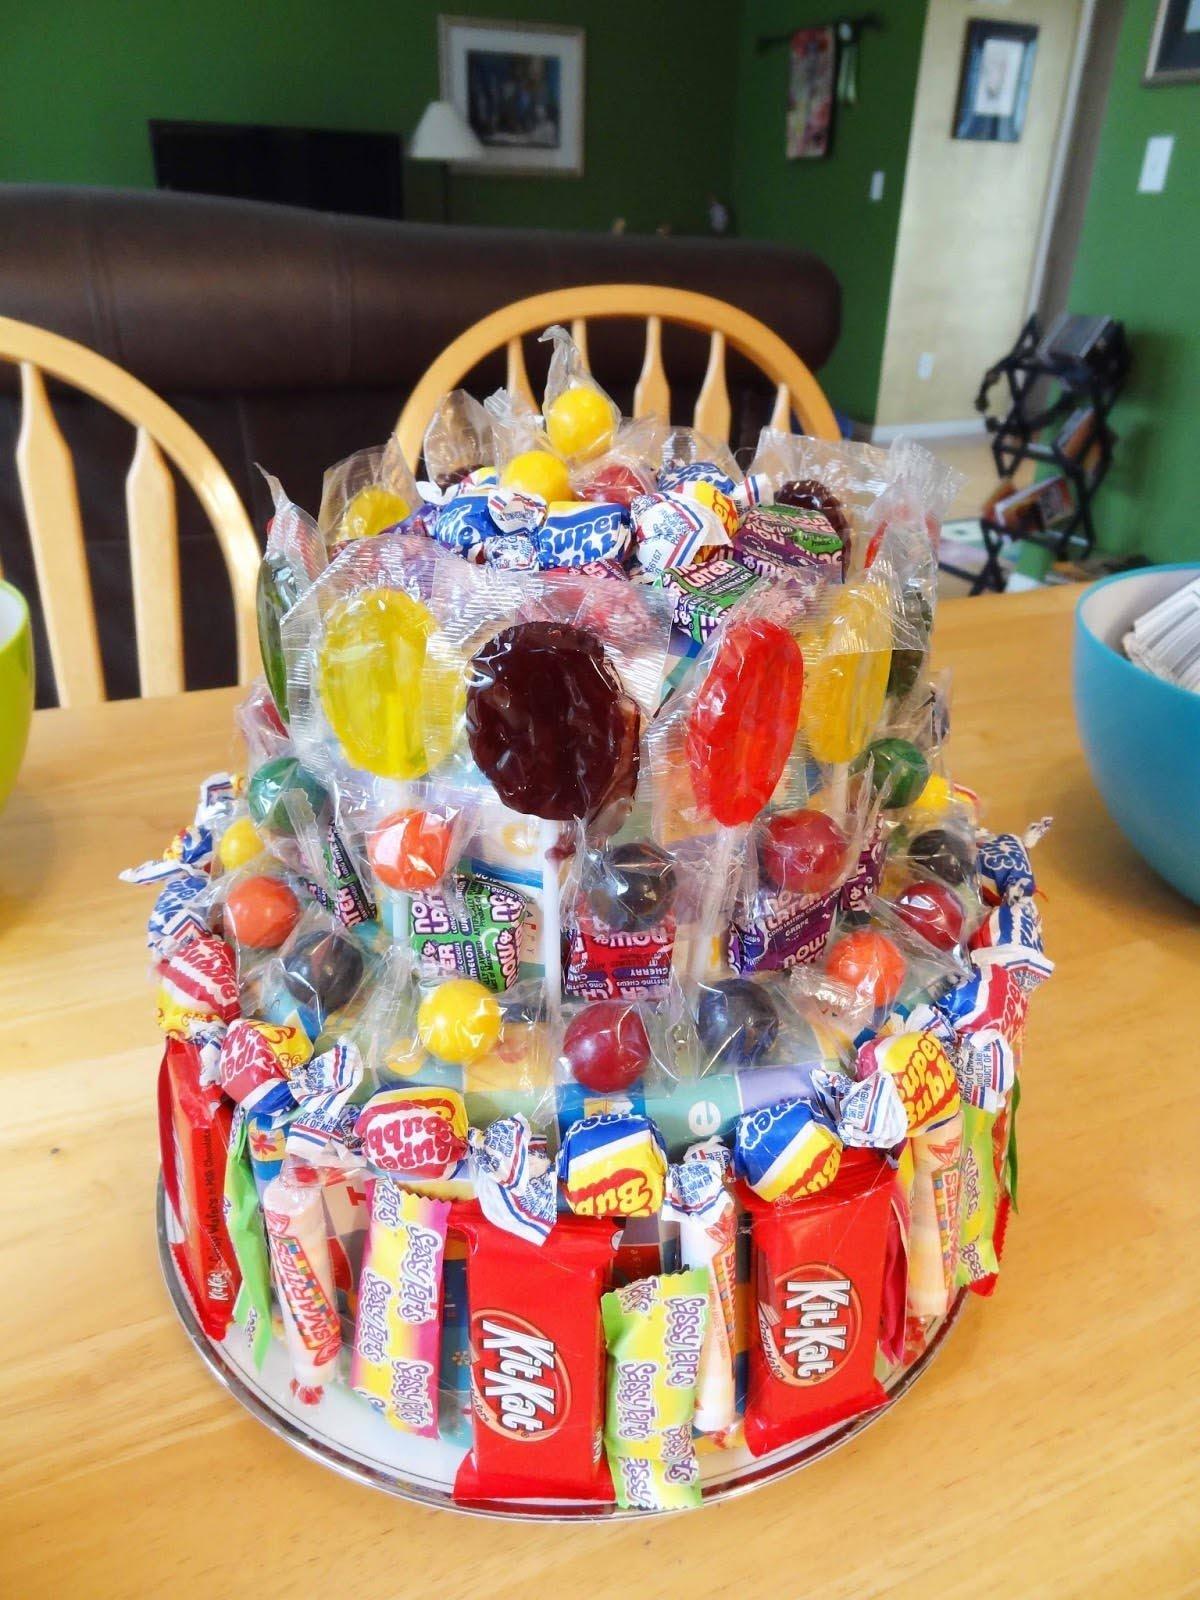 10 Unique Ideas For Teenage Birthday Parties birthday party ideas for teens 15 home party ideas 2 2020